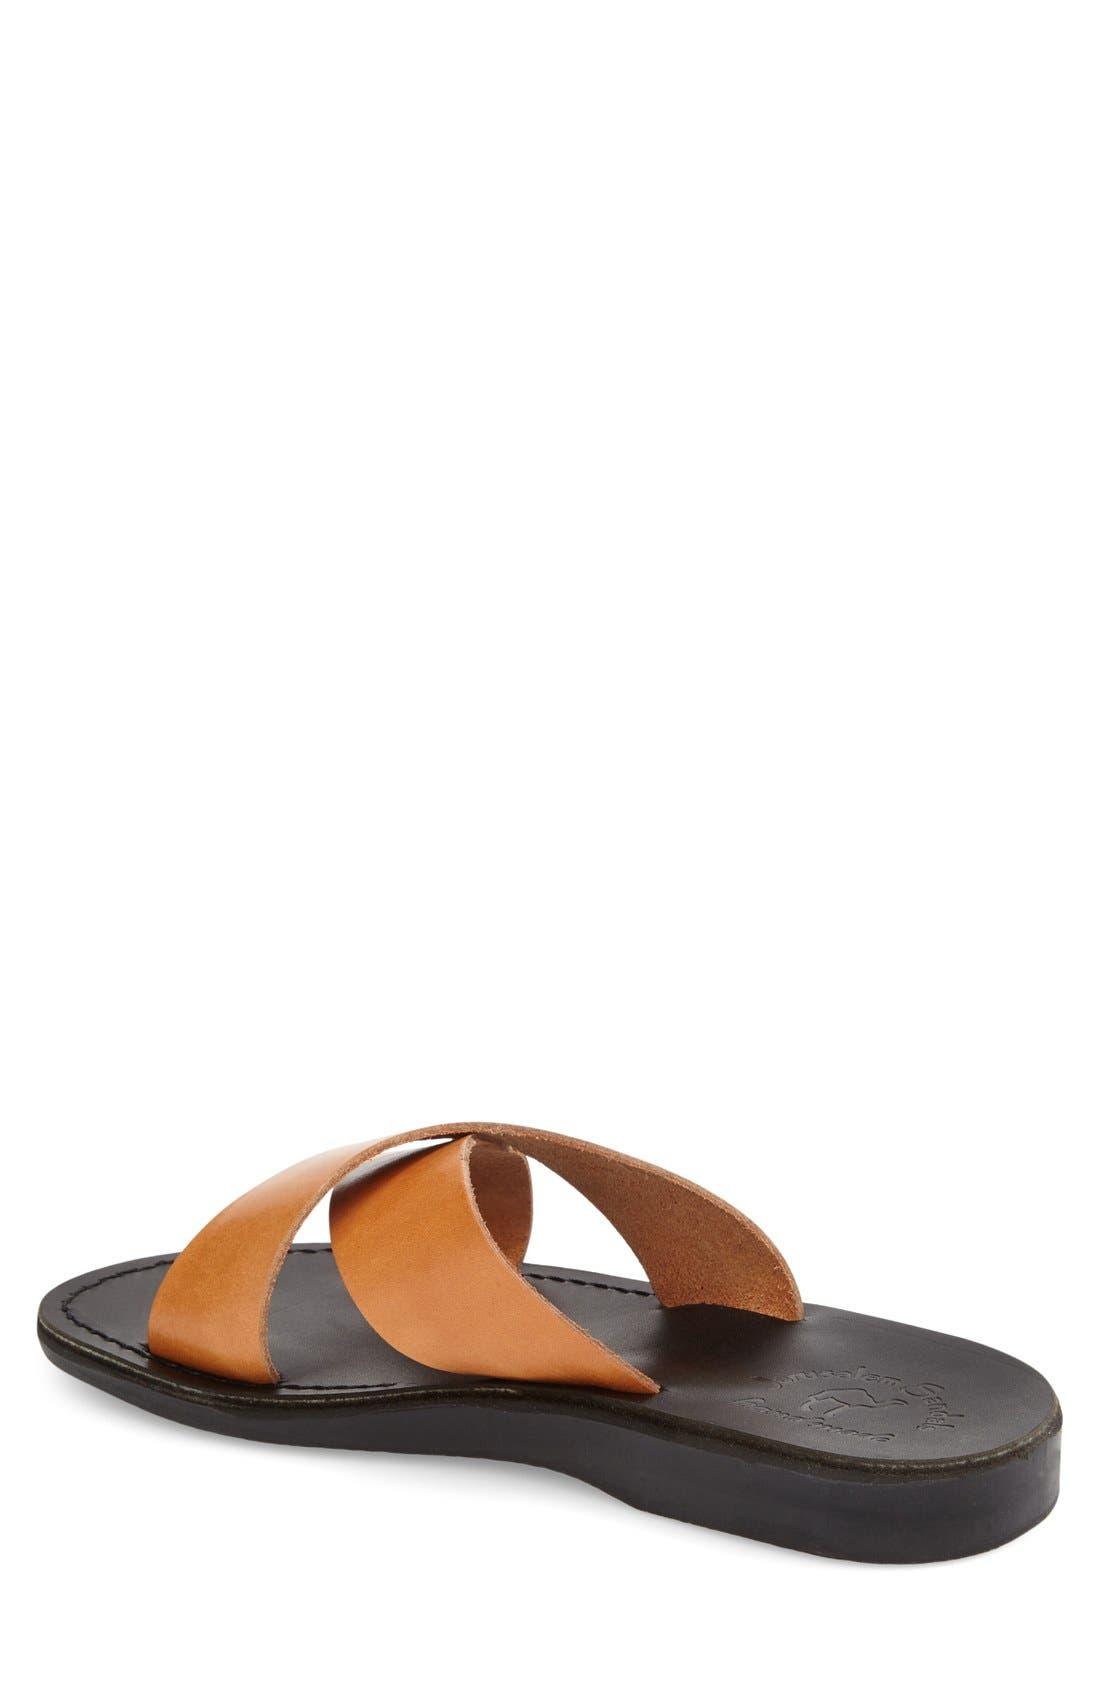 'Elan' Slide Sandal,                             Alternate thumbnail 3, color,                             TAN LEATHER/ BLACK